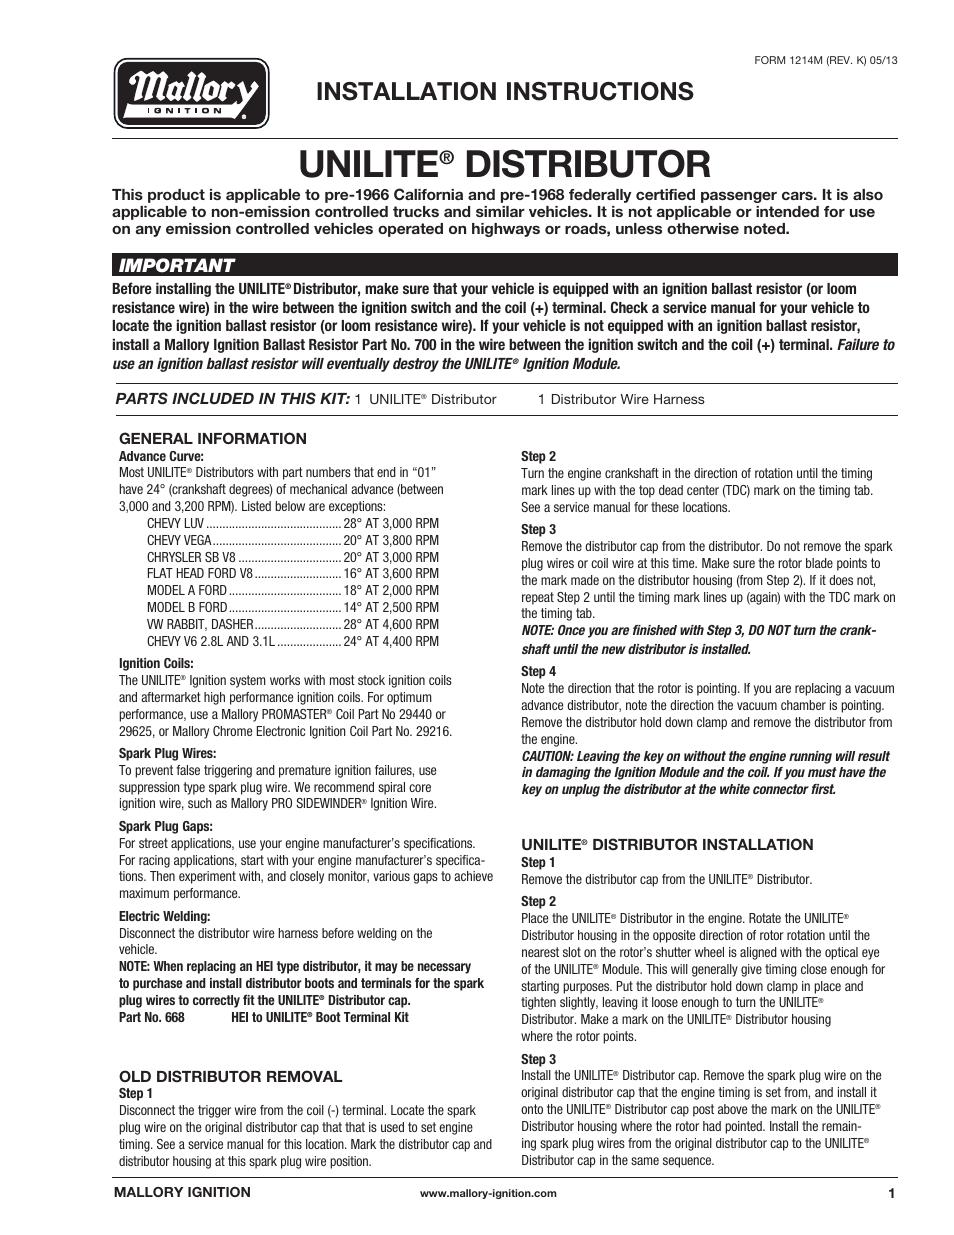 mallory ignition mallory unilite distributor 37_38_45_47 page1?resize=665%2C861 3748201 mallory ignition wiring diagrams mallory breakerless  at readyjetset.co